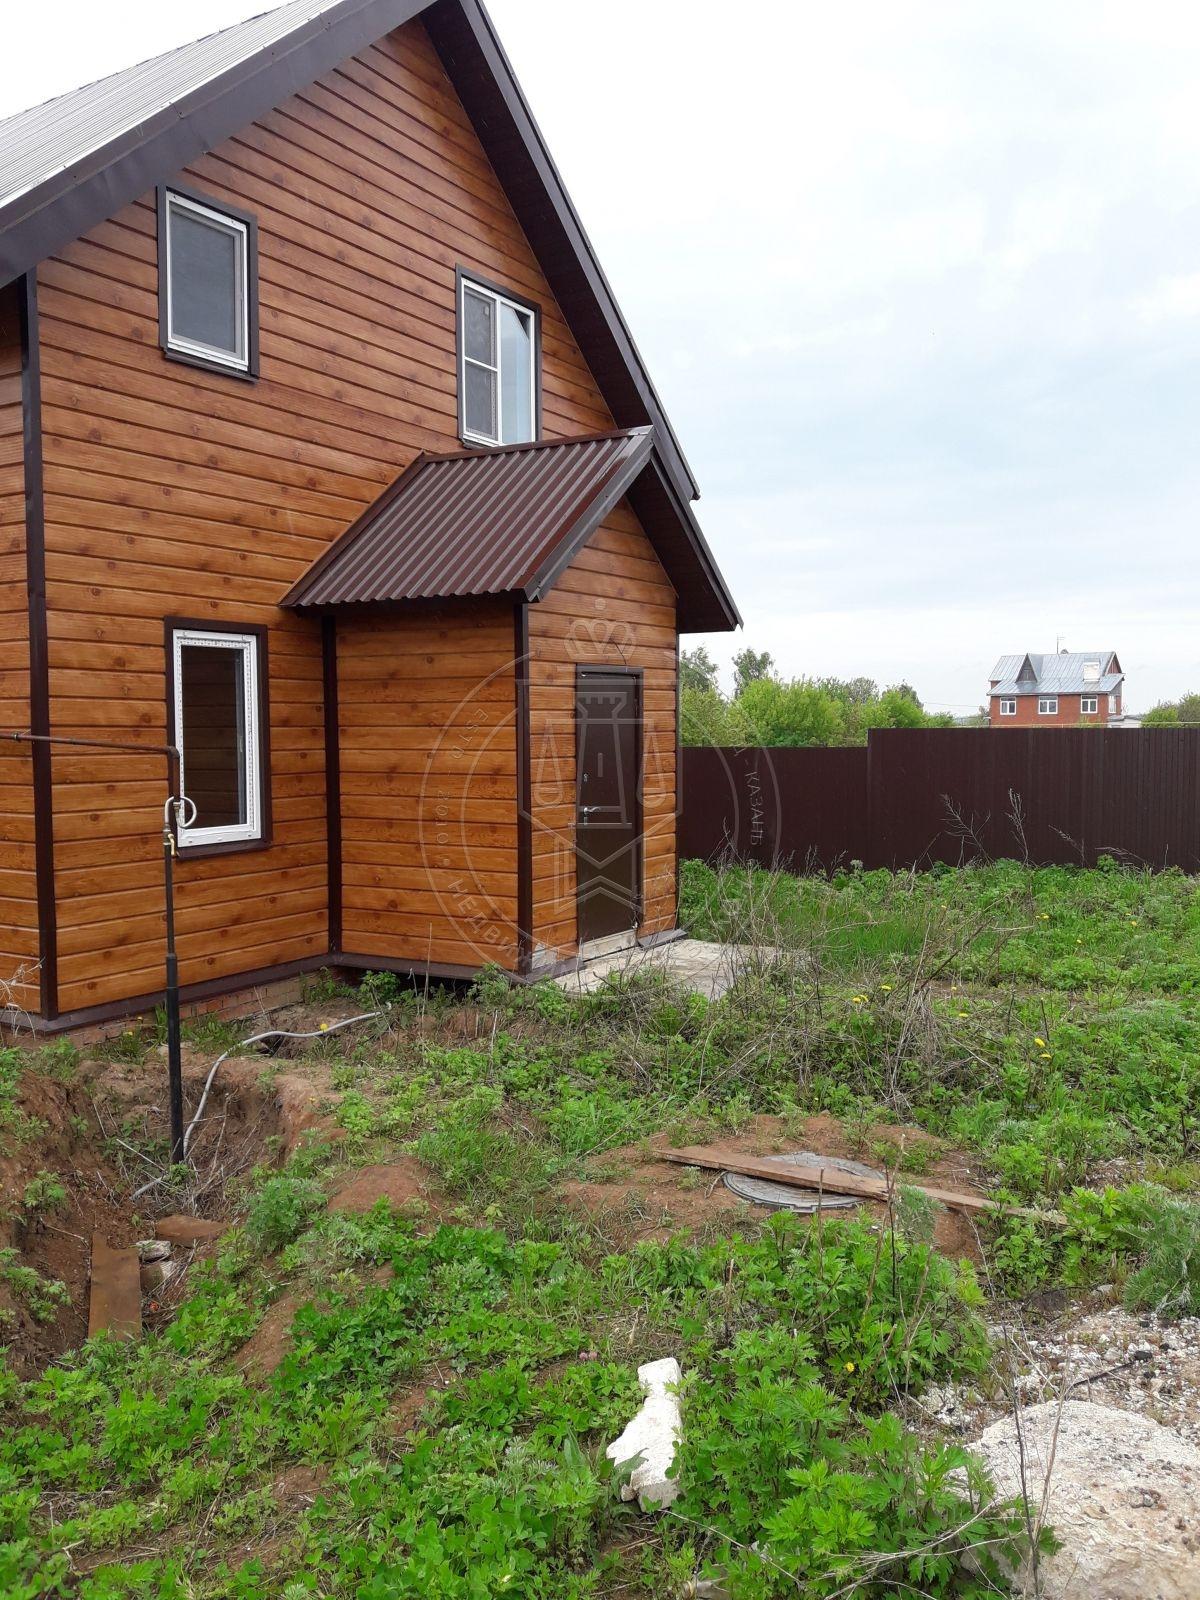 Продажа  дома п. Куюки, ул Центральная, 100.0 м² (миниатюра №7)